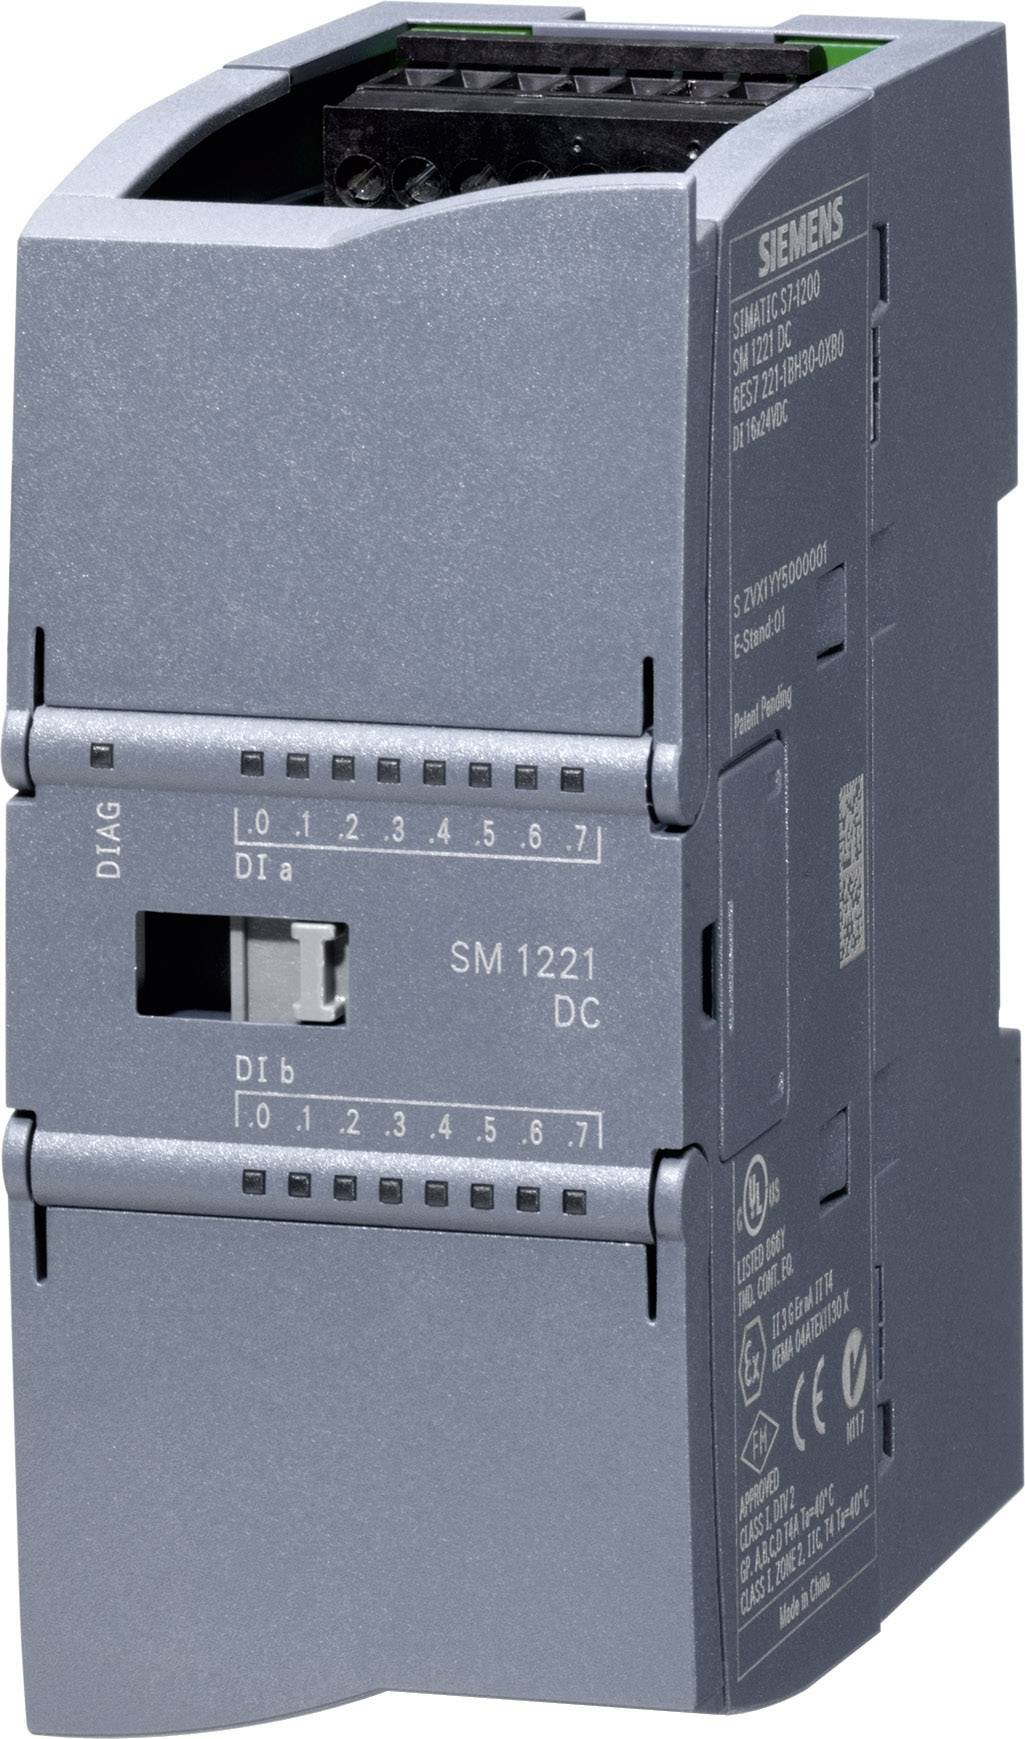 Rozšiřovací modul Siemens SM 1221 (6ES7221-1BF32-0XB0)